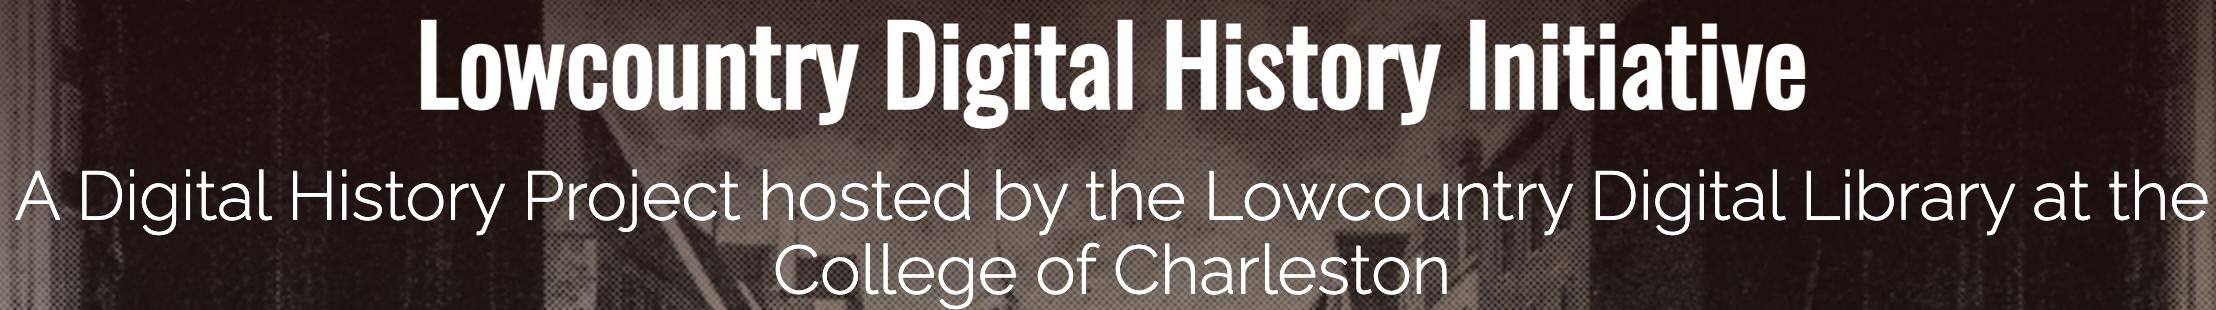 Lowcountry Digital History Initiative LDHI